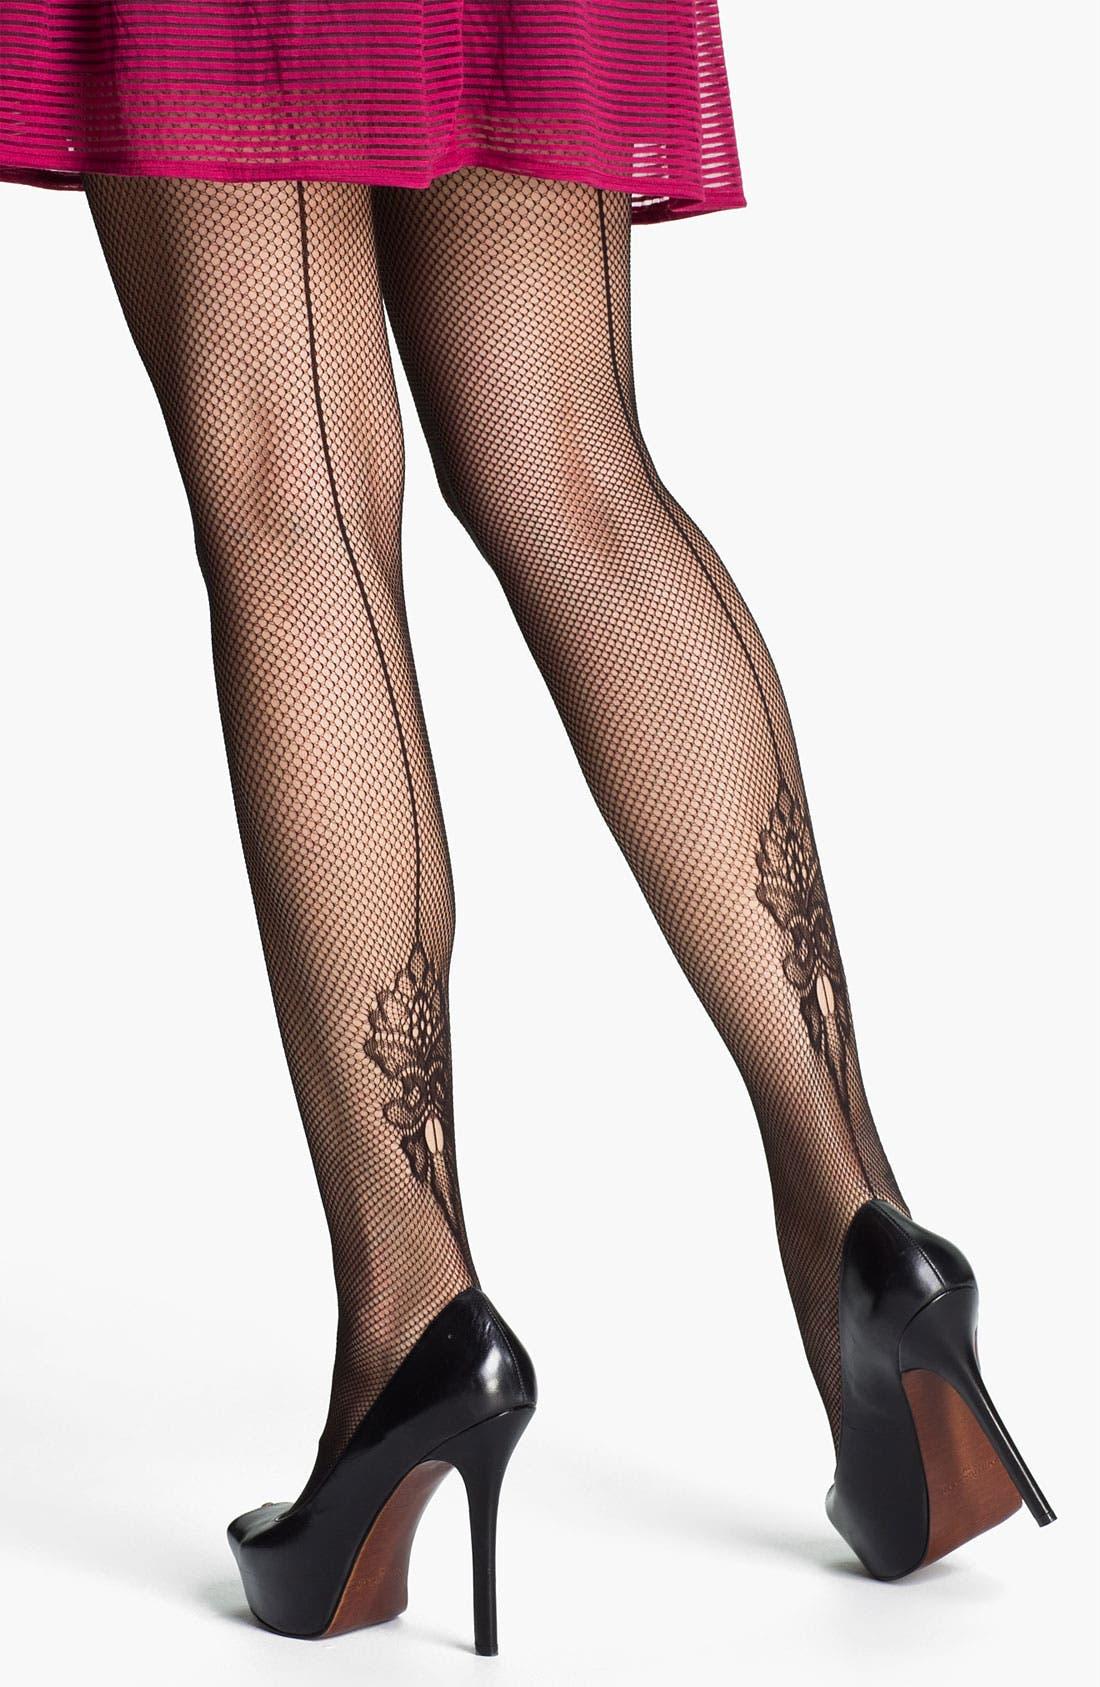 Main Image - SPANX® 'Uptown Floral' Back Seam Fishnet Pantyhose